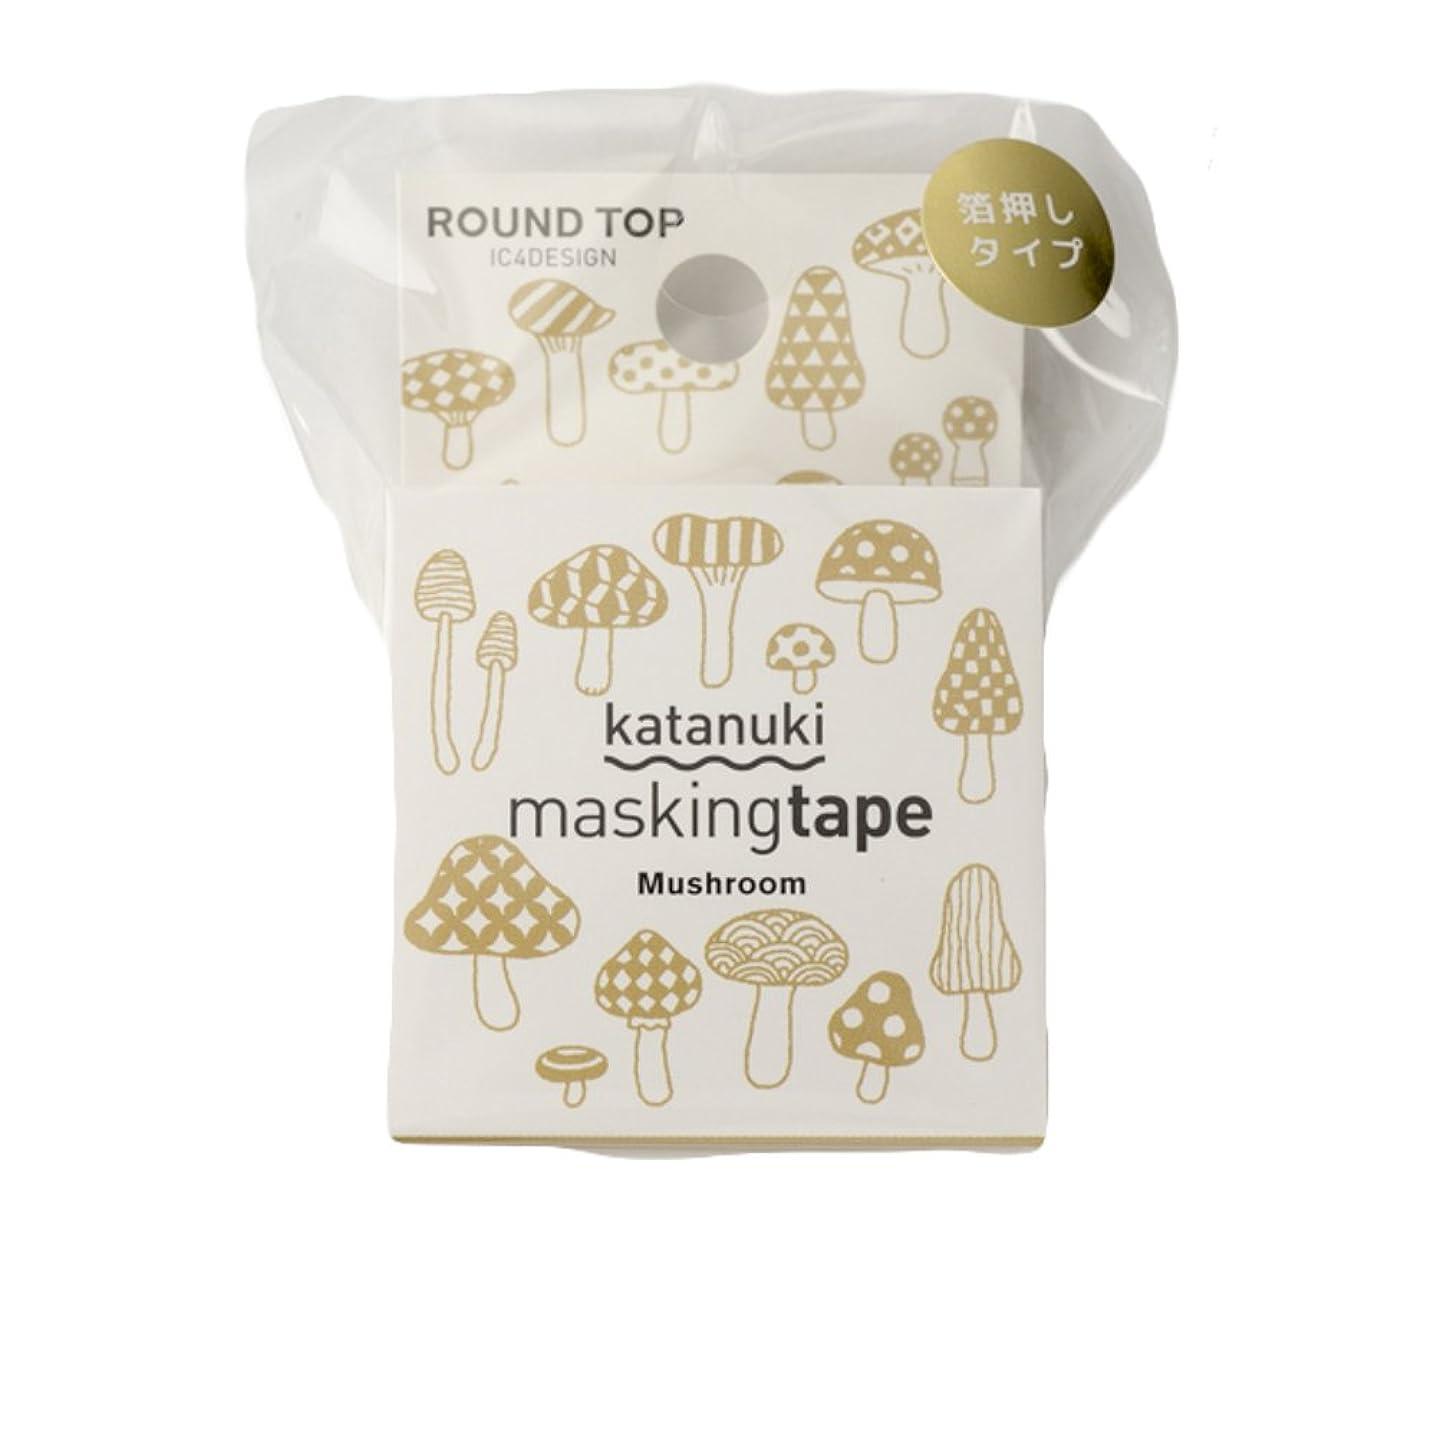 Roundtop Designer's Washi Masking Tape 20mm x 5m, Tips Plated Masking Tape, Mushrooms (RT-MK-043)